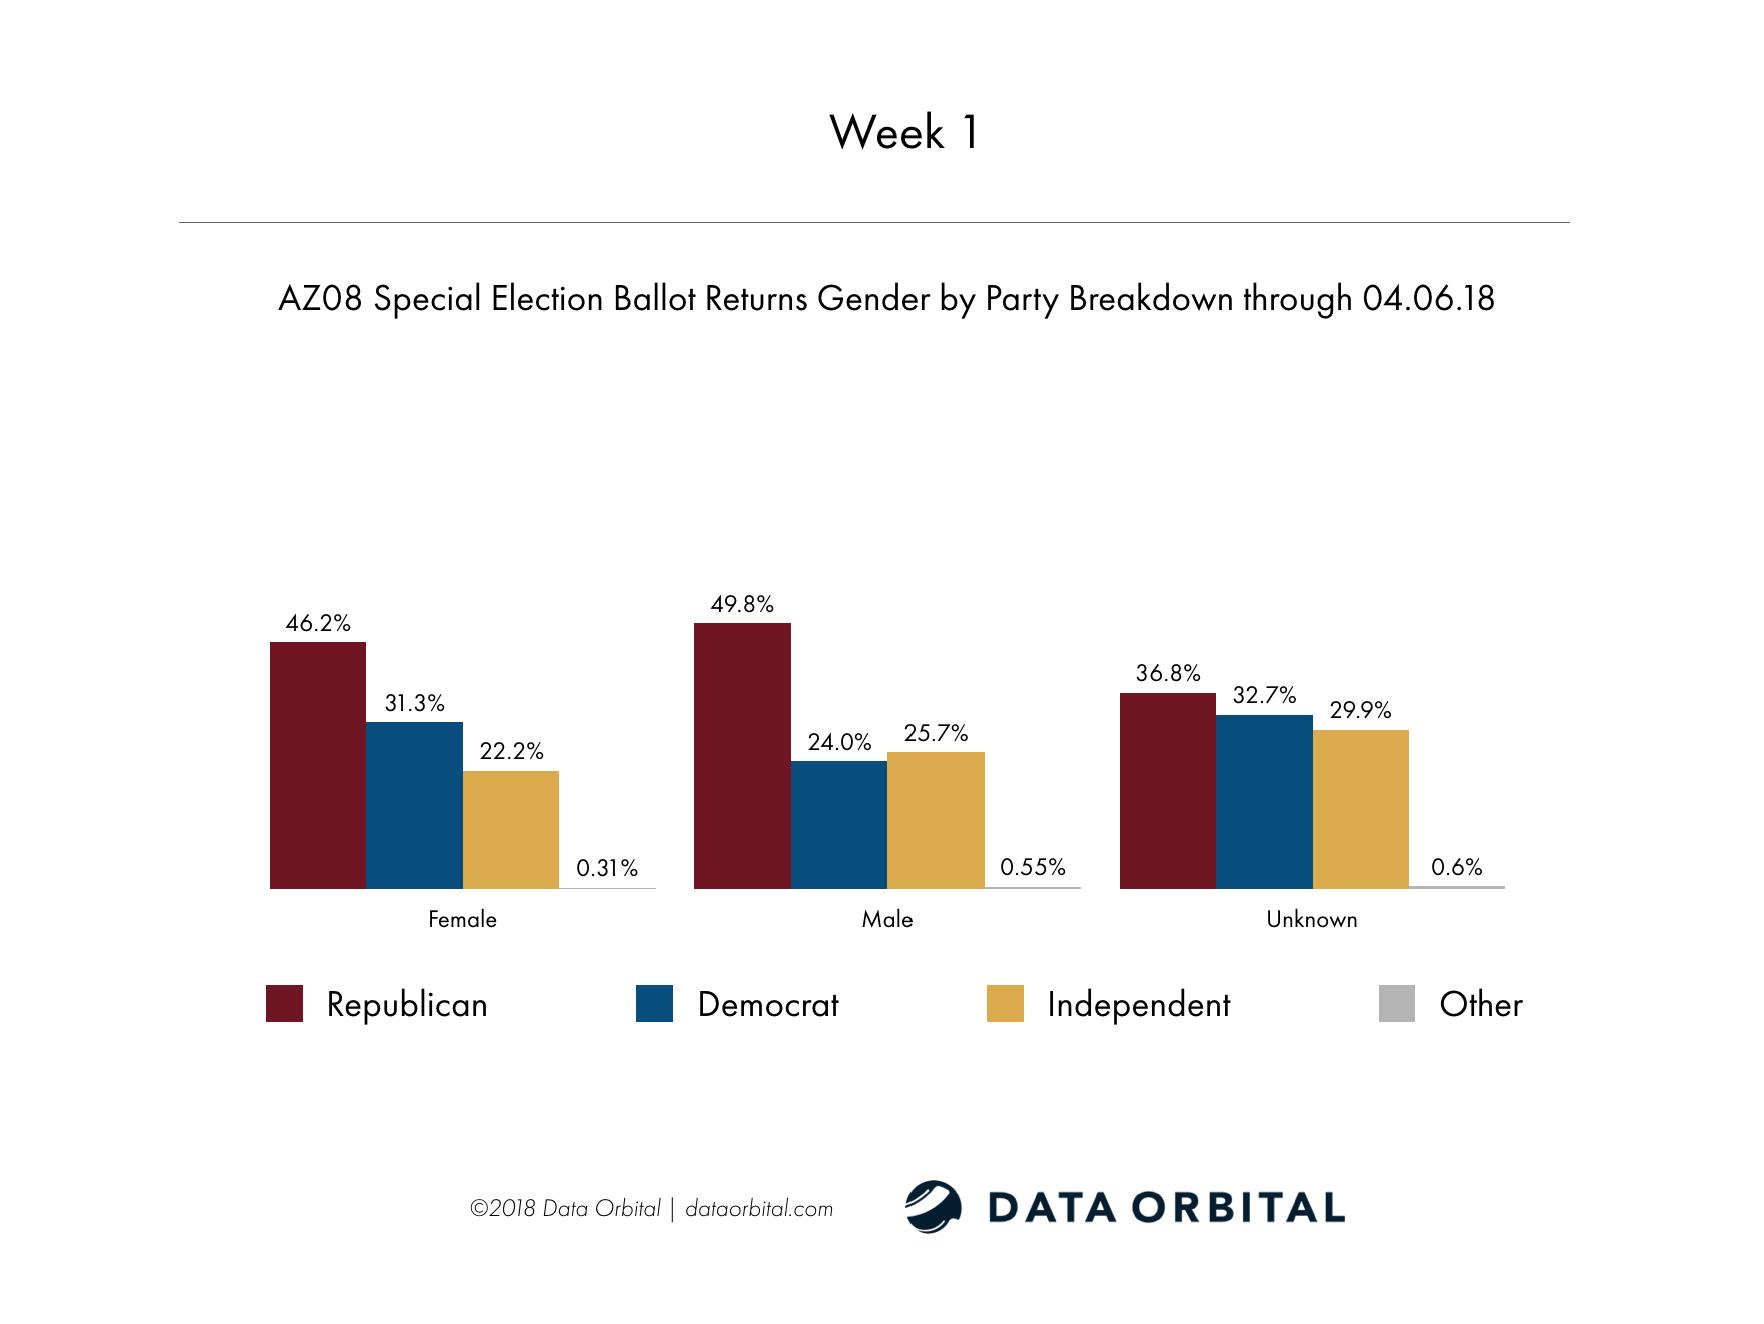 AZ08 Special Election Week 2 Wrap Up Gender by Party Breakdown Week 1